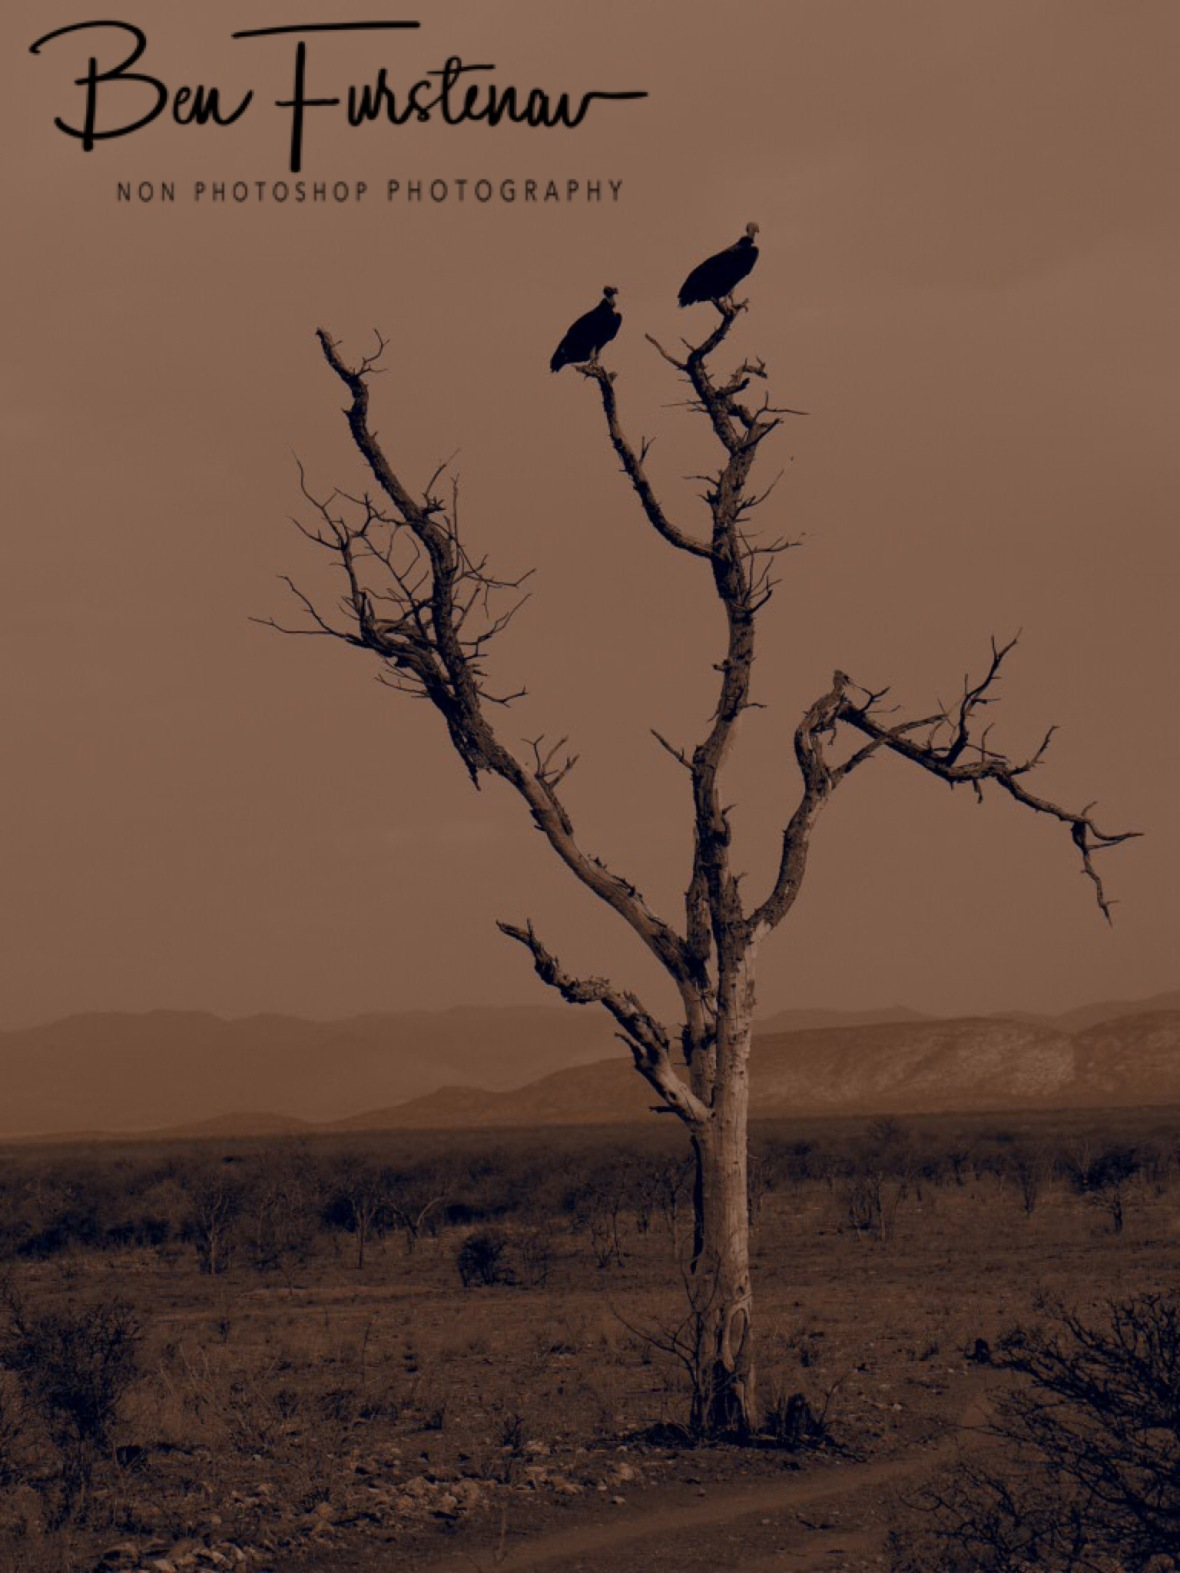 Arid desert land, Sophienhof, Outjo, Namibia